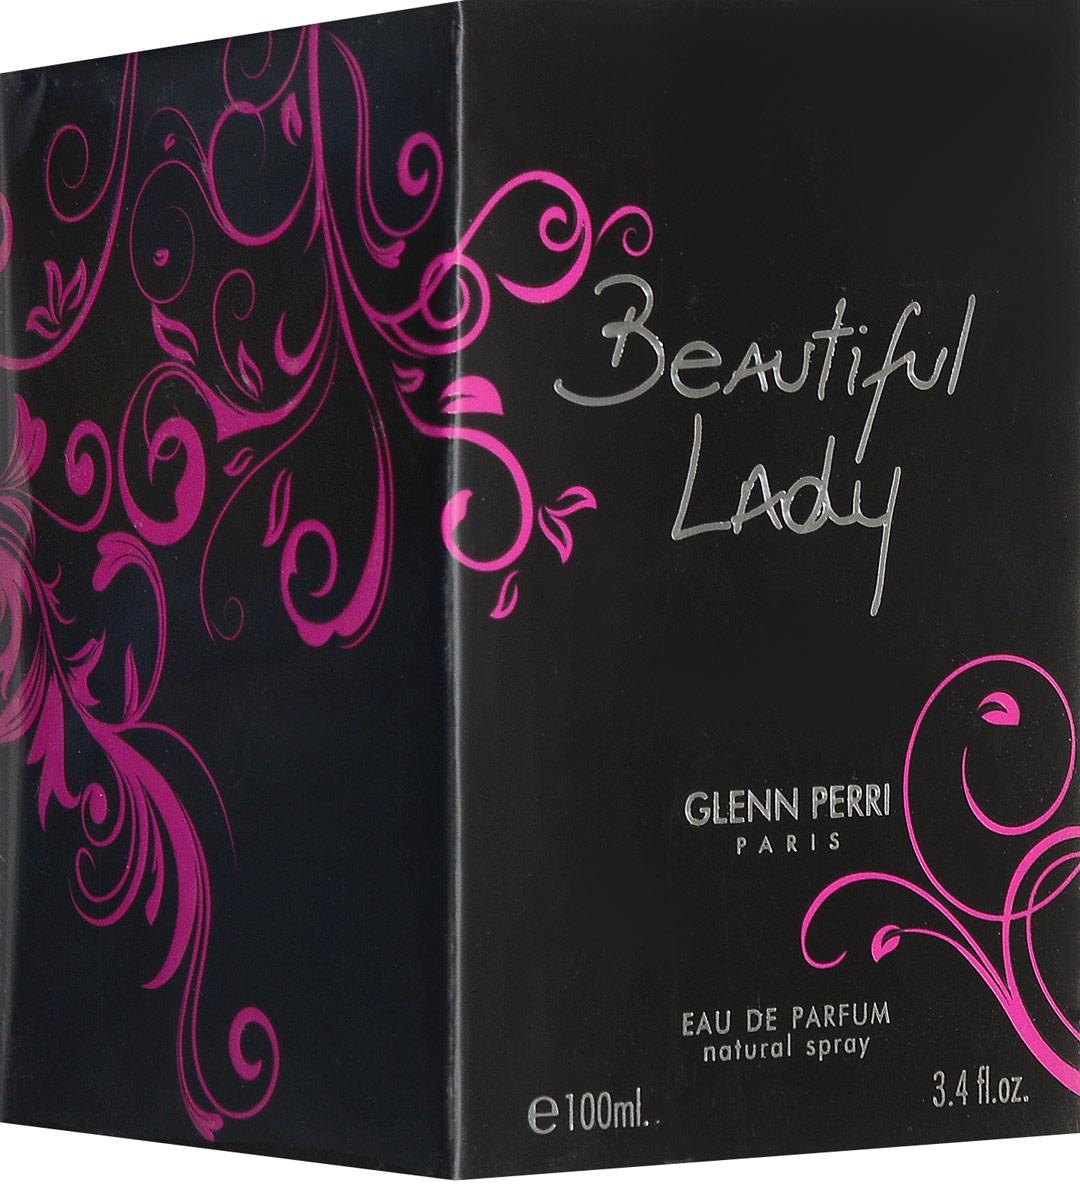 Geparlys Парфюмерная вода Beautiful Lady for women Линии Parfums Glenn Perri, 100 мл geparlys beautiful lady w edp 100 мл